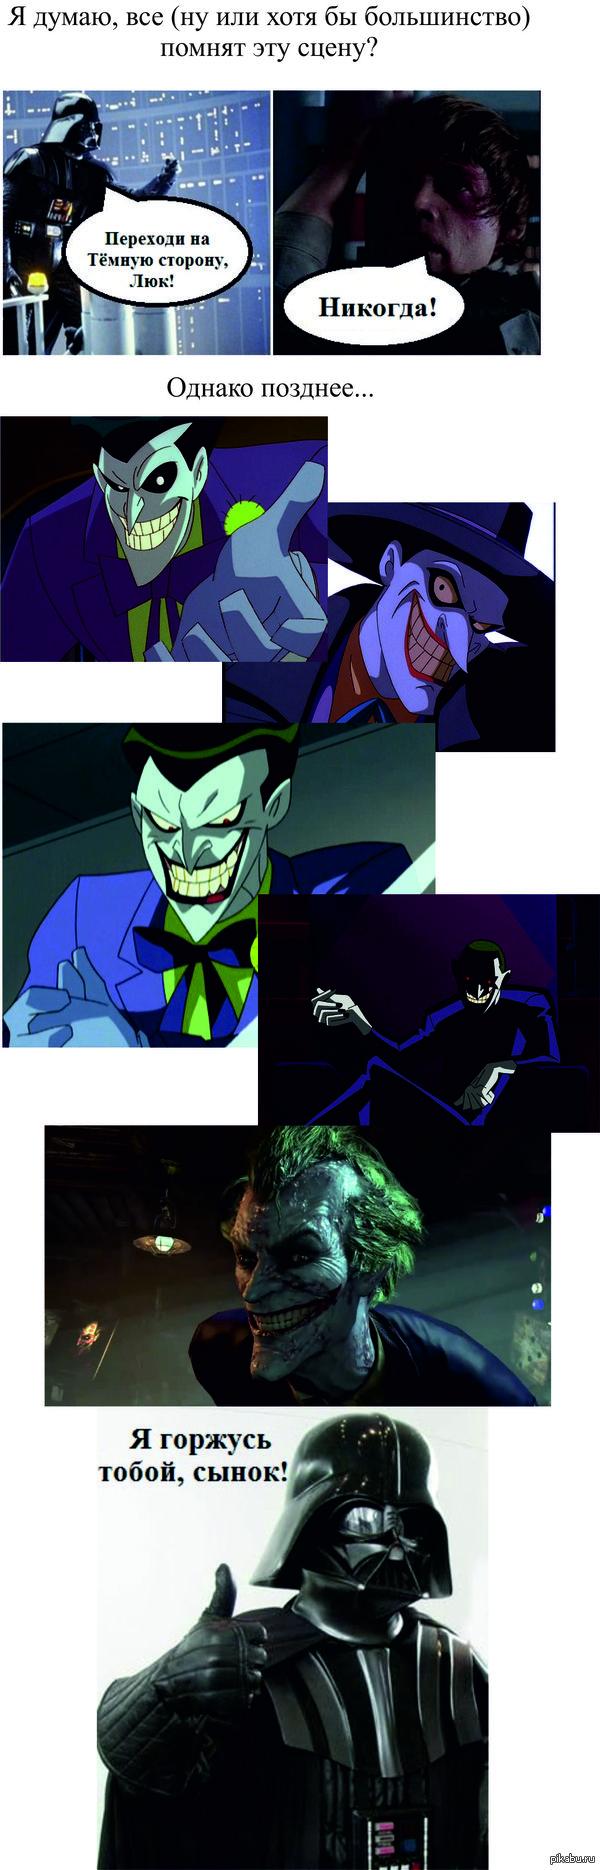 Внезапно задумался На правах Кэпа: практически всех Джокеров бессменно озвучивал Марк Хэмилл.